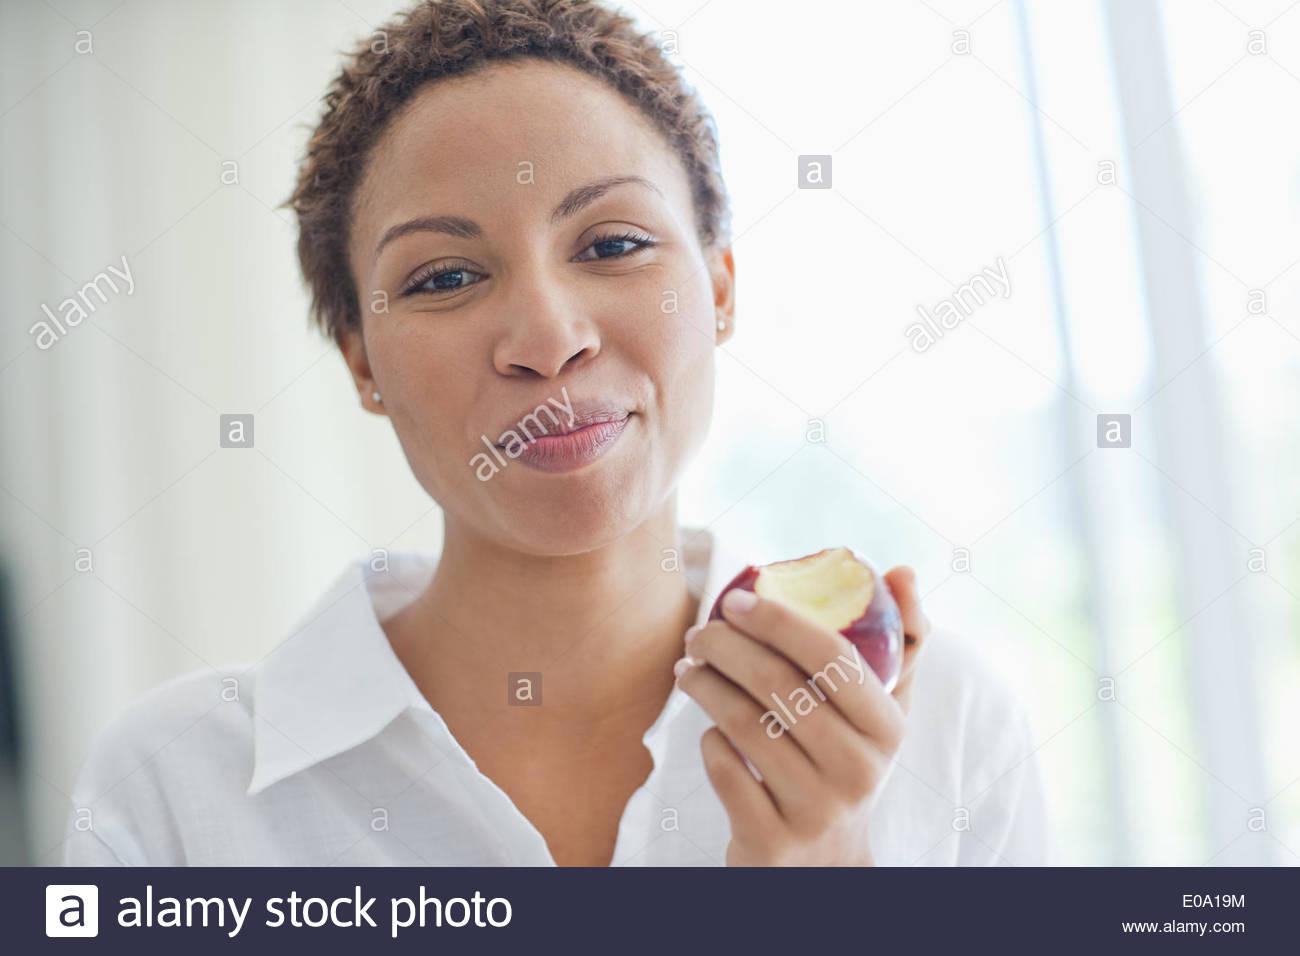 Woman eating apple - Stock Image